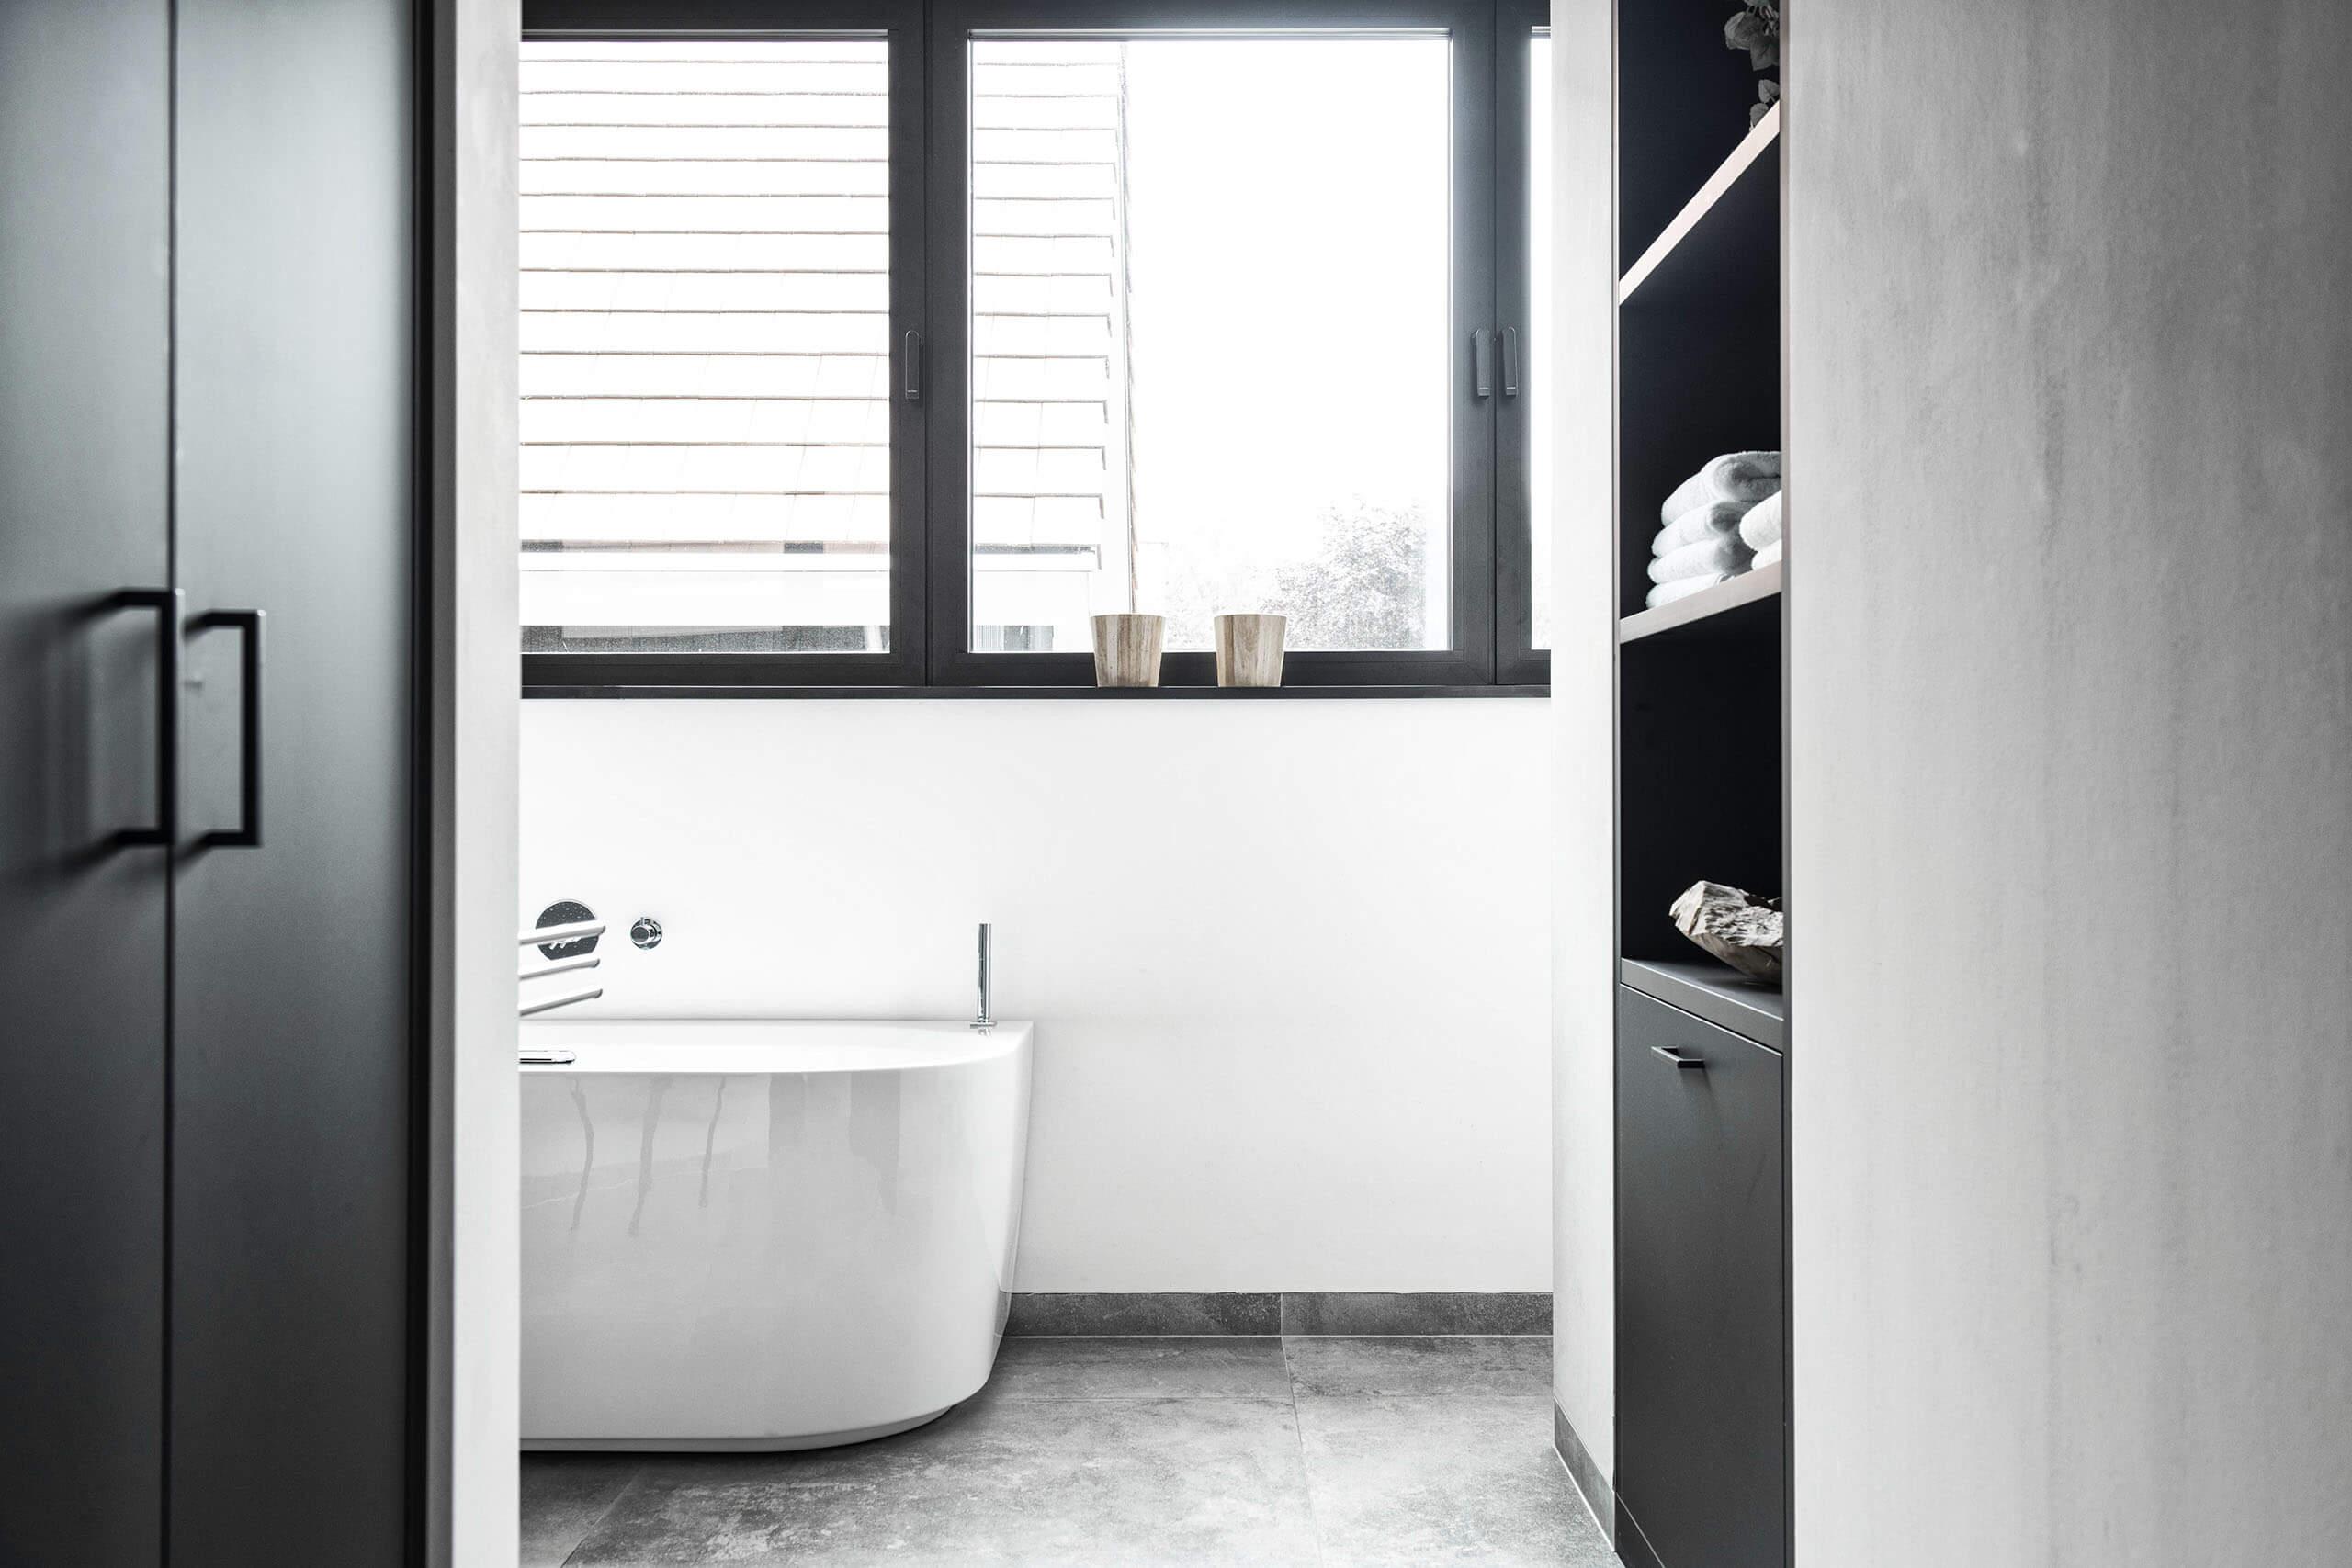 fotografie interieur badkamer stijl